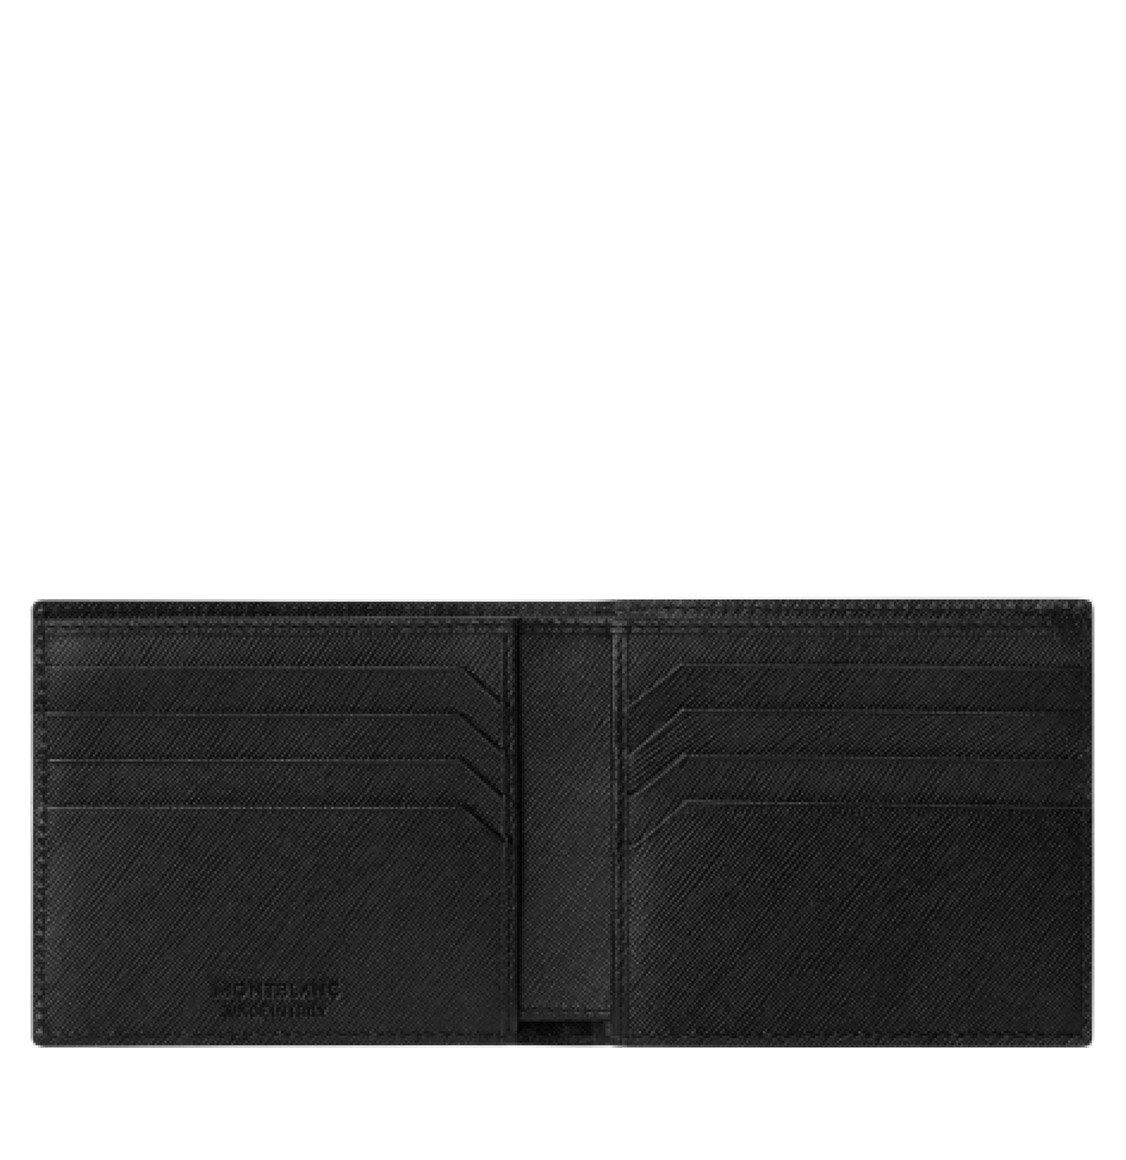 Montblanc Sartorial Wallet 8 Credit Cards